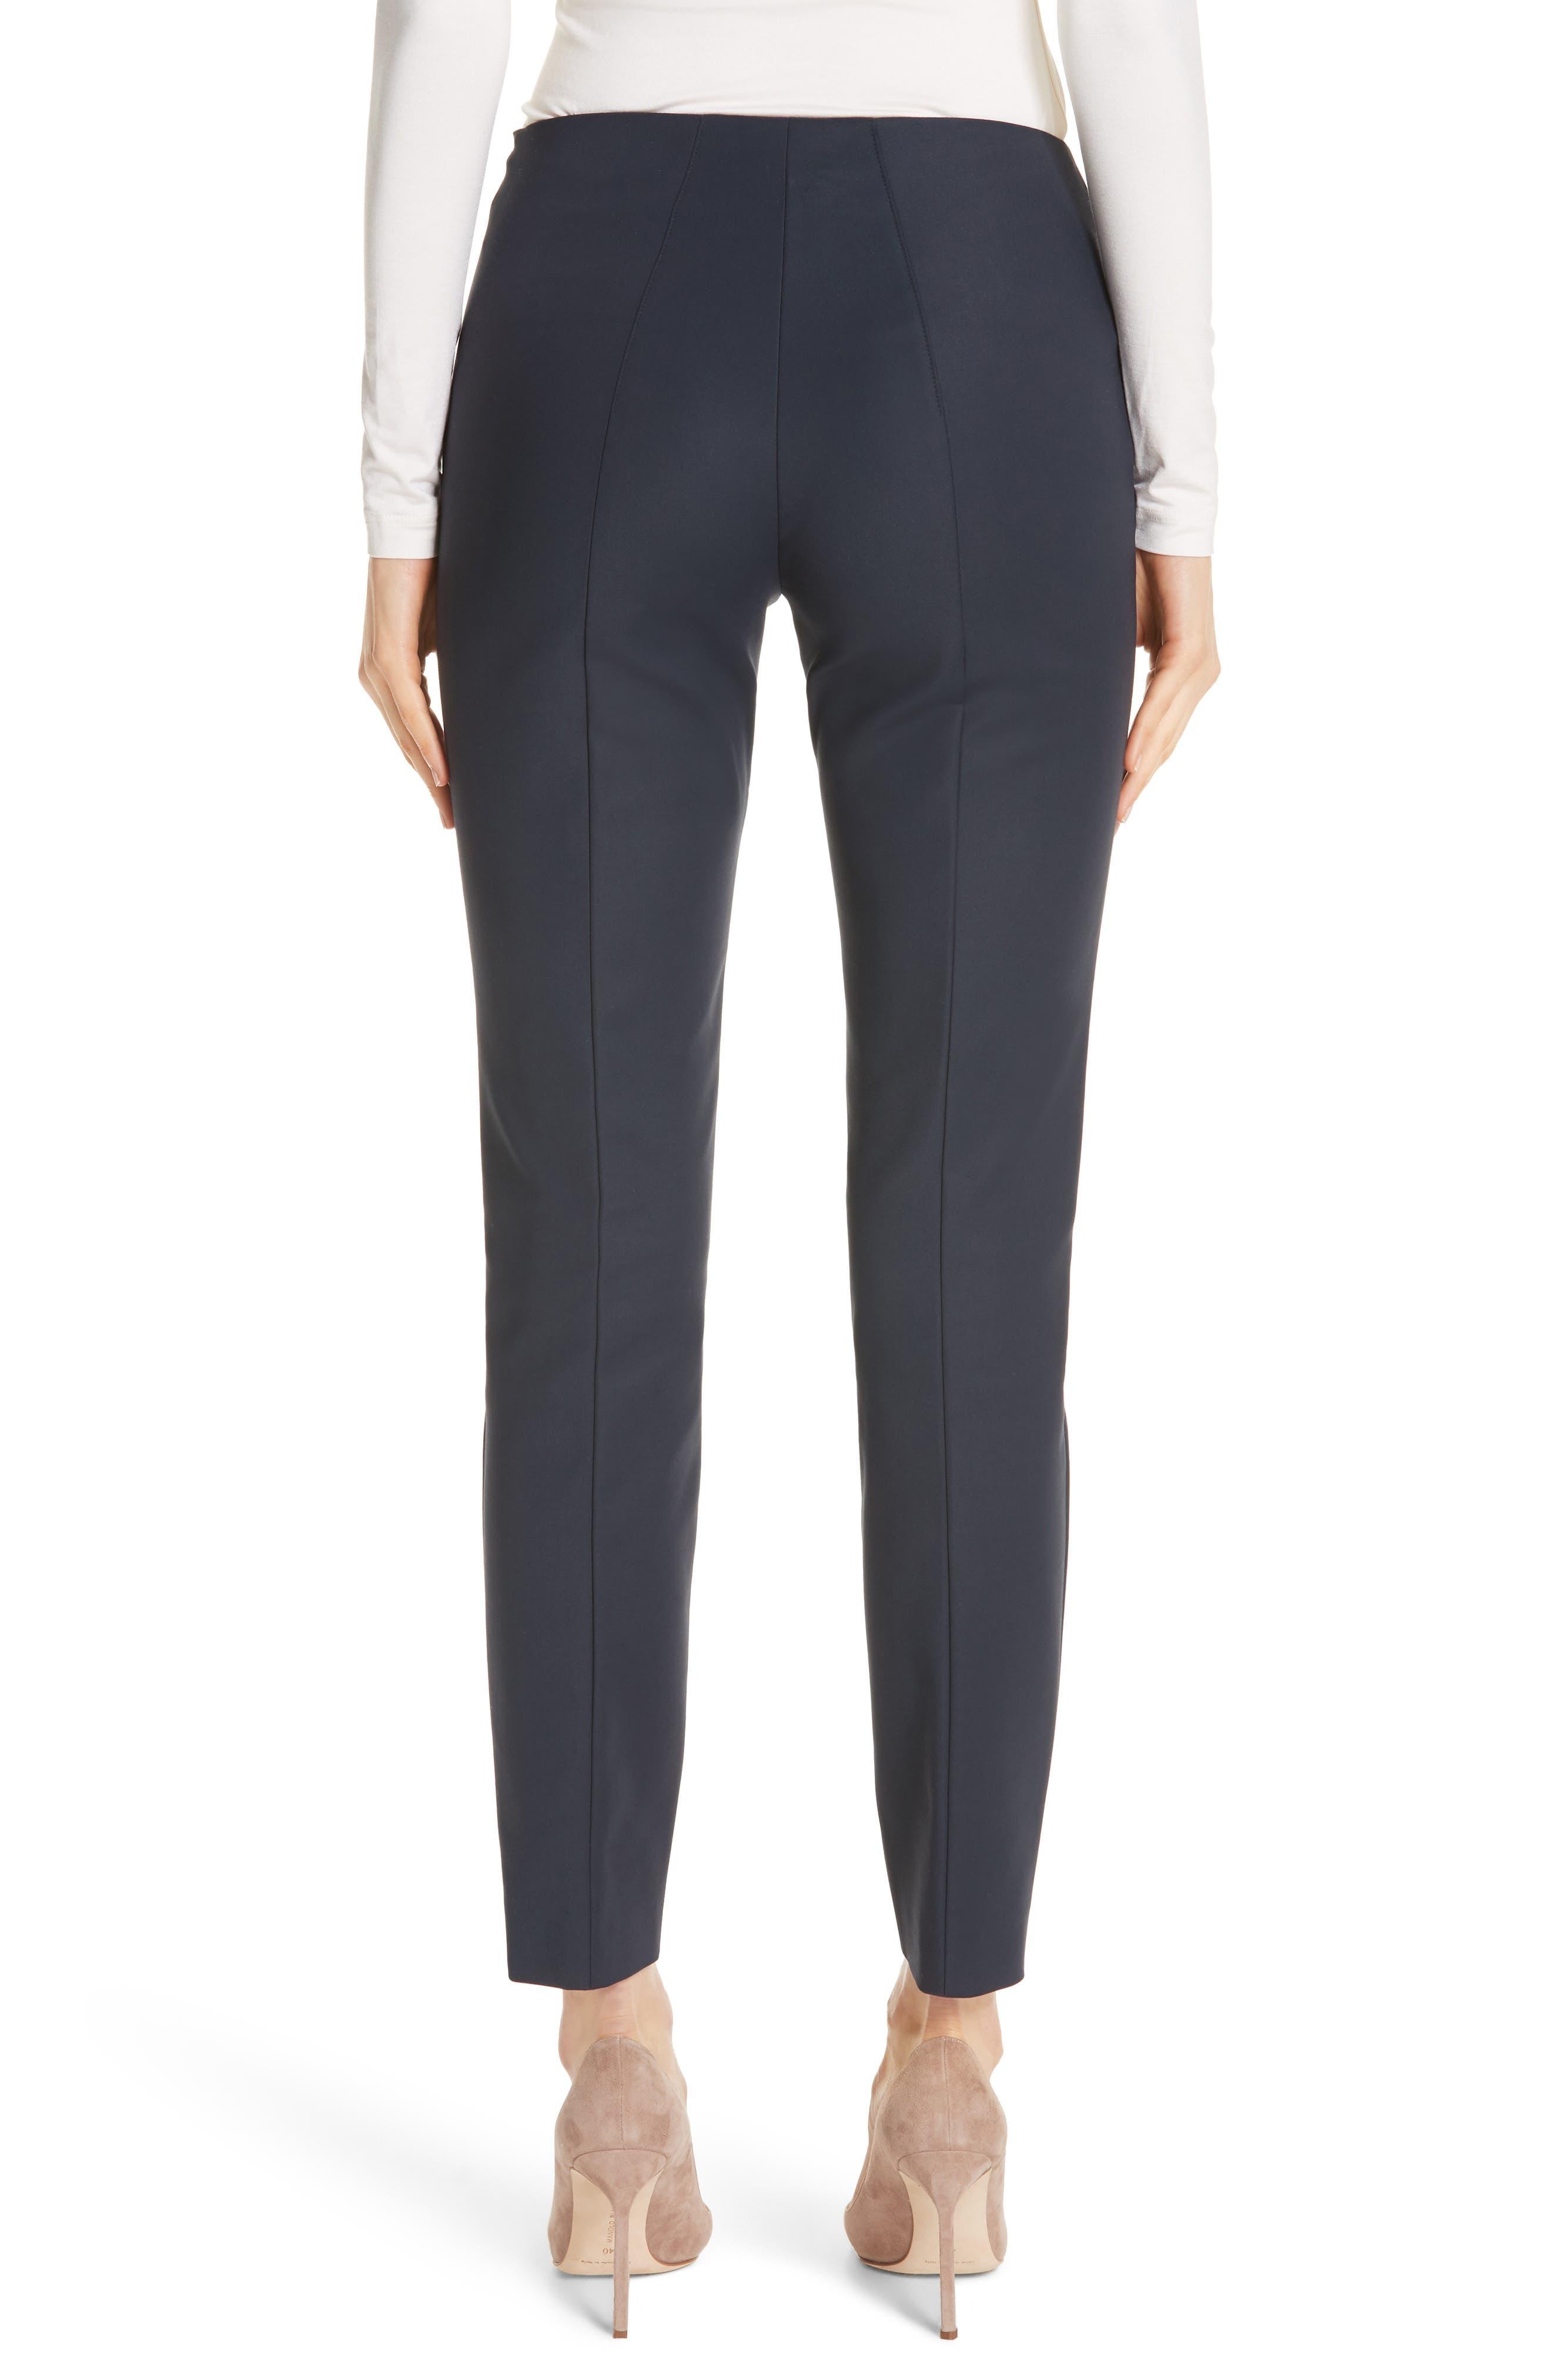 AKRIS, 'Melissa' Slim Techno Cotton Ankle Pants, Alternate thumbnail 2, color, NAVY